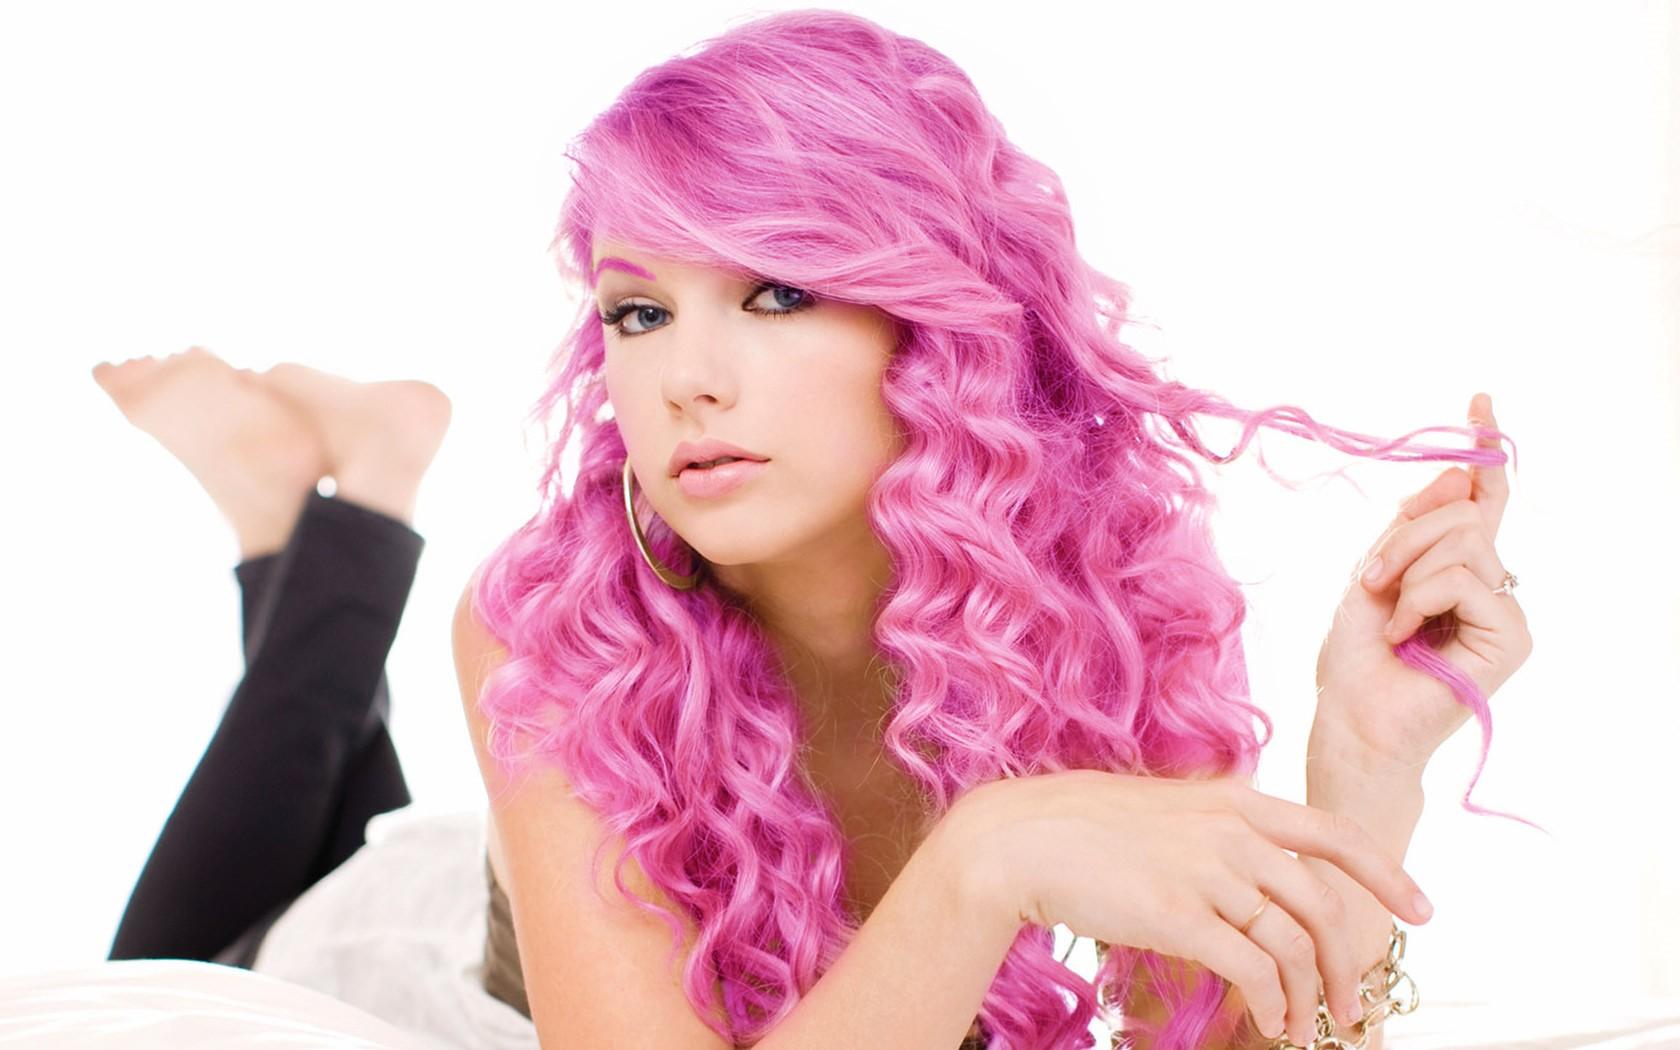 Taylor Swift y su pelo fucsia - 1680x1050